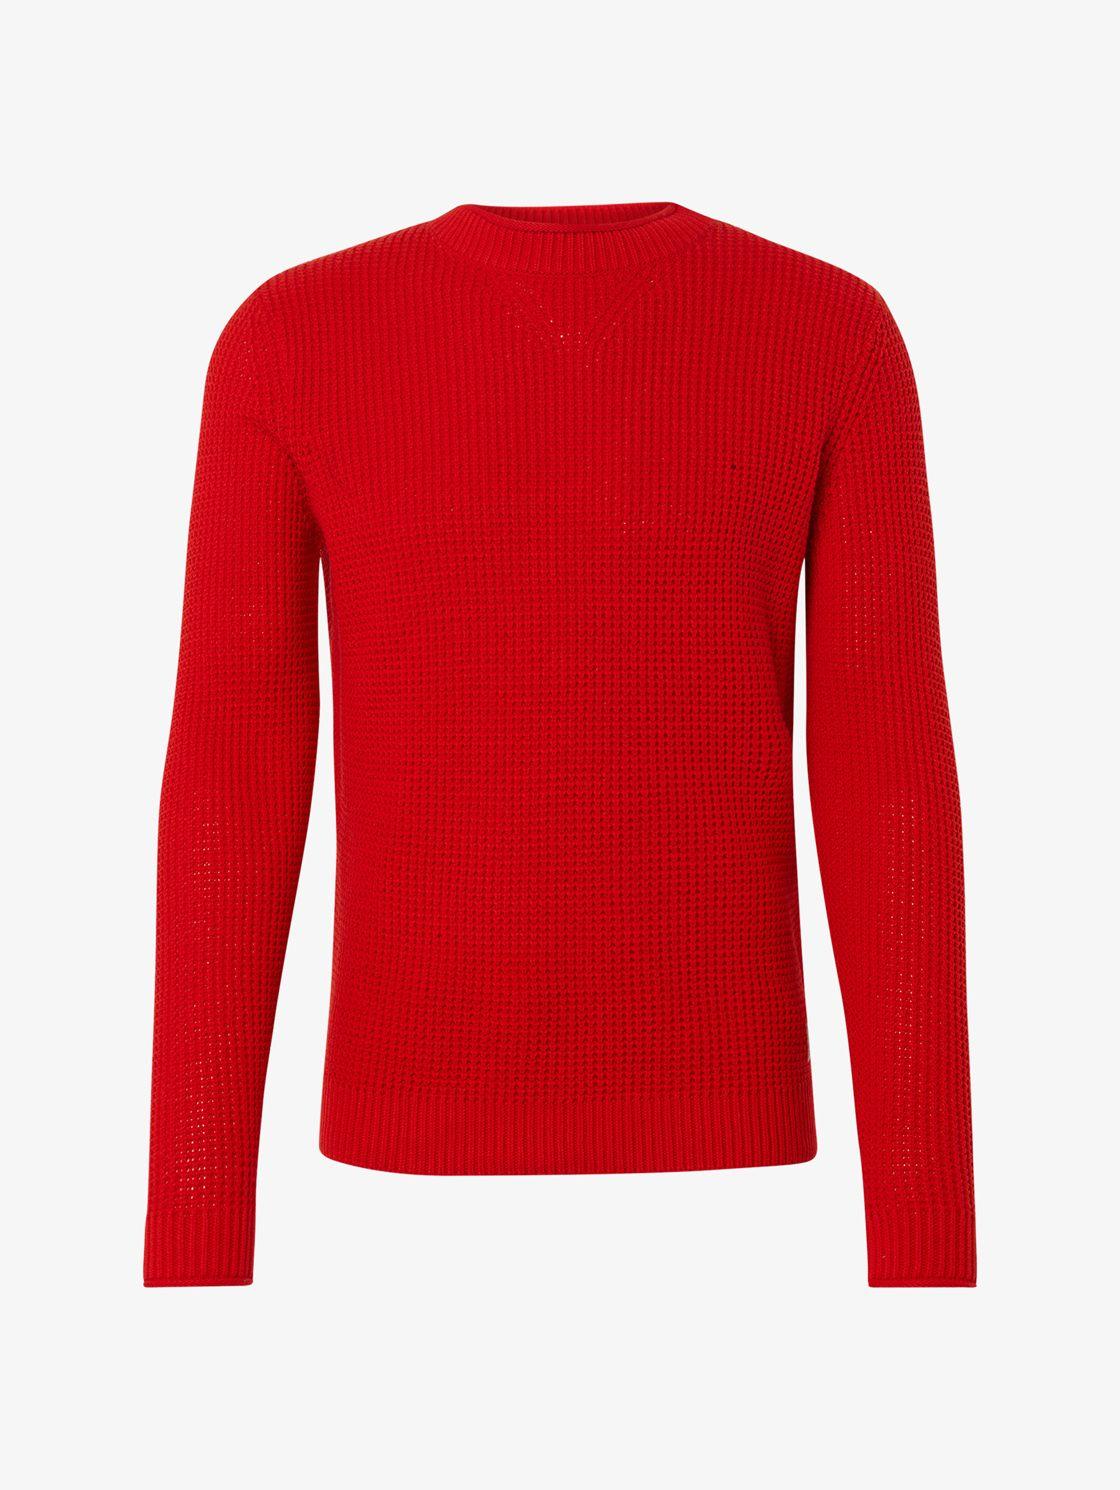 Фото #1: Пуловер